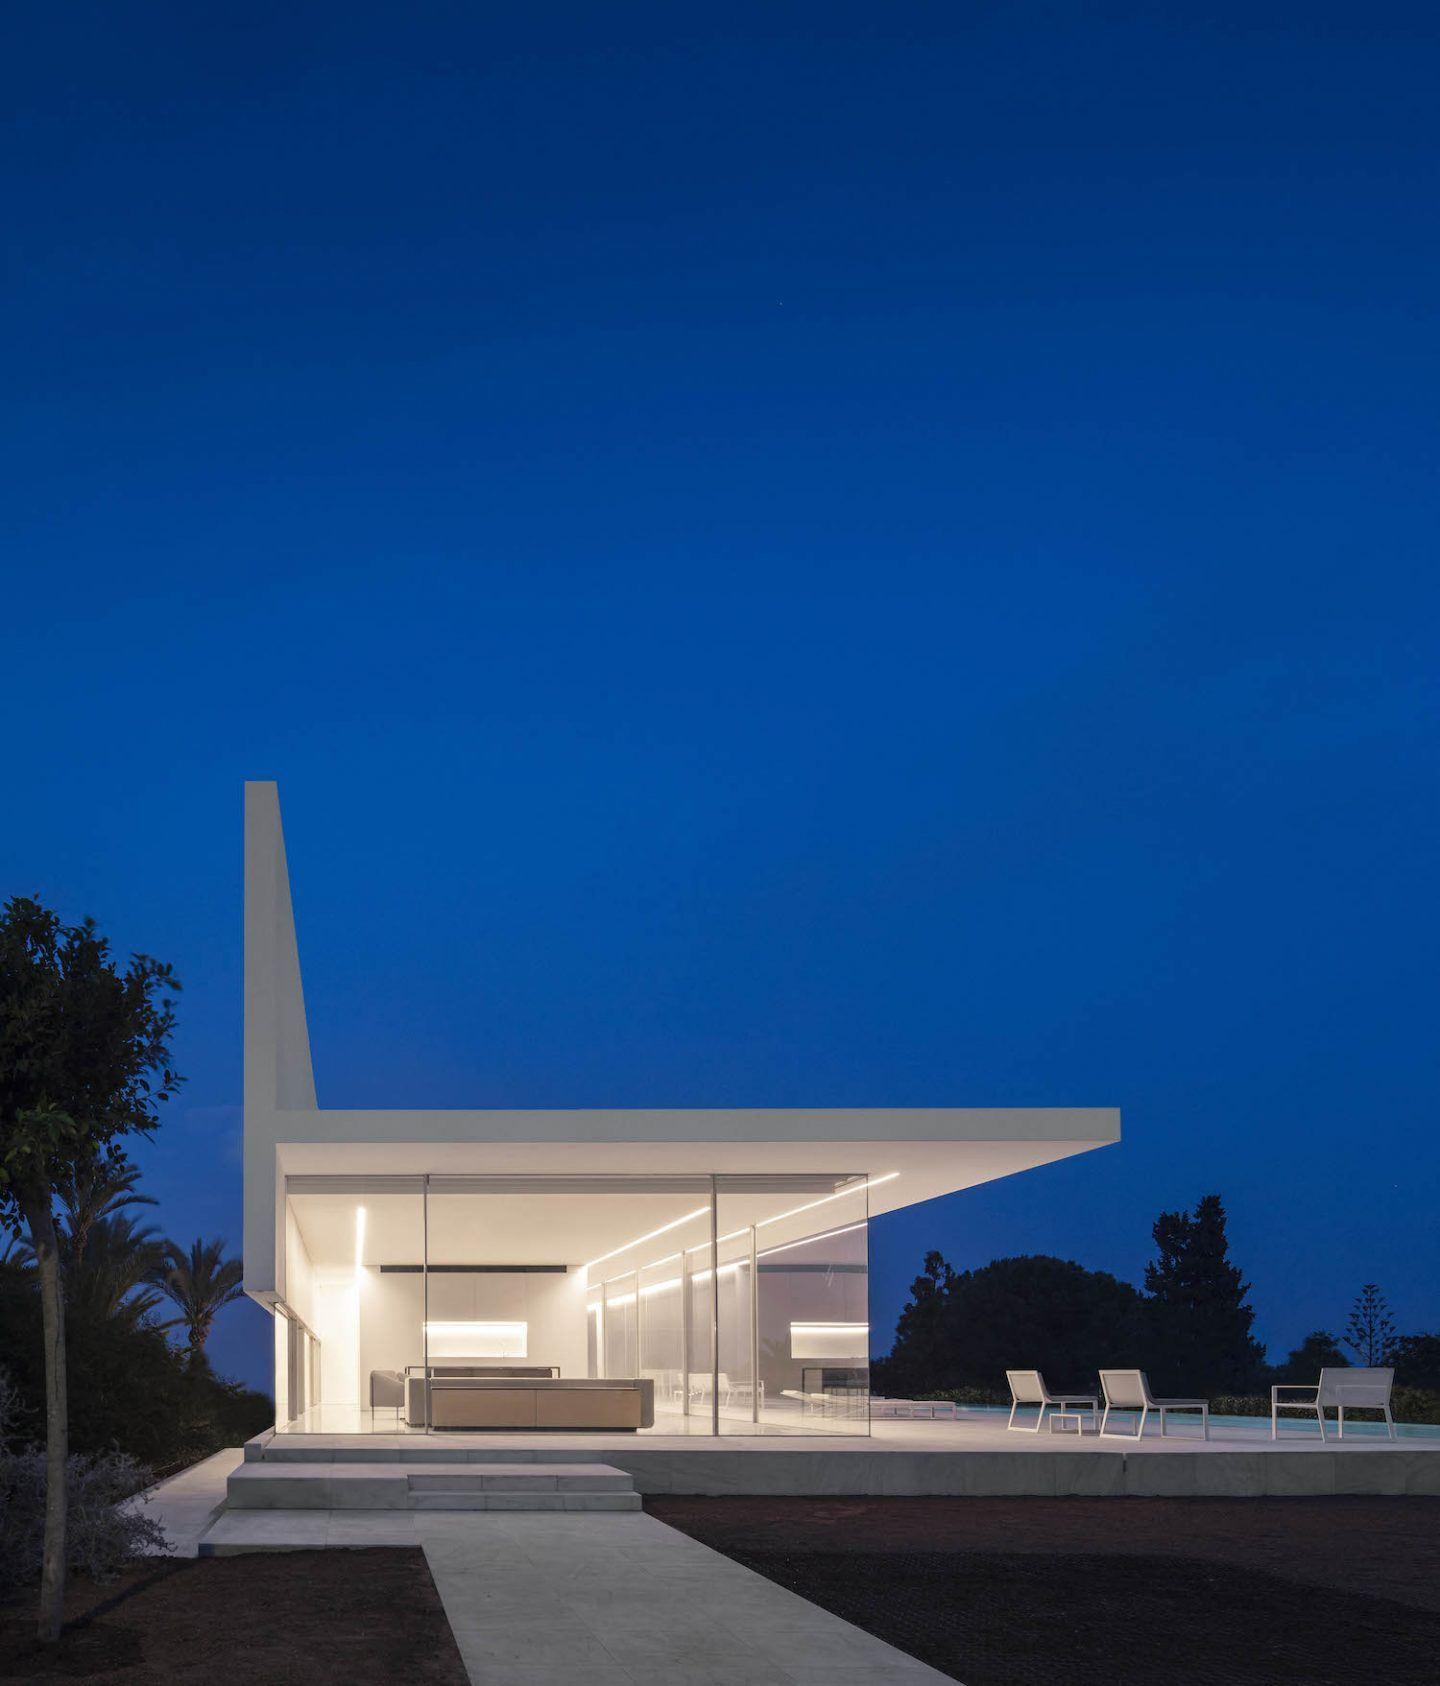 IGNANT-Architecture-Fran-Silvestre-Arquitectos-Hofmann-House-4